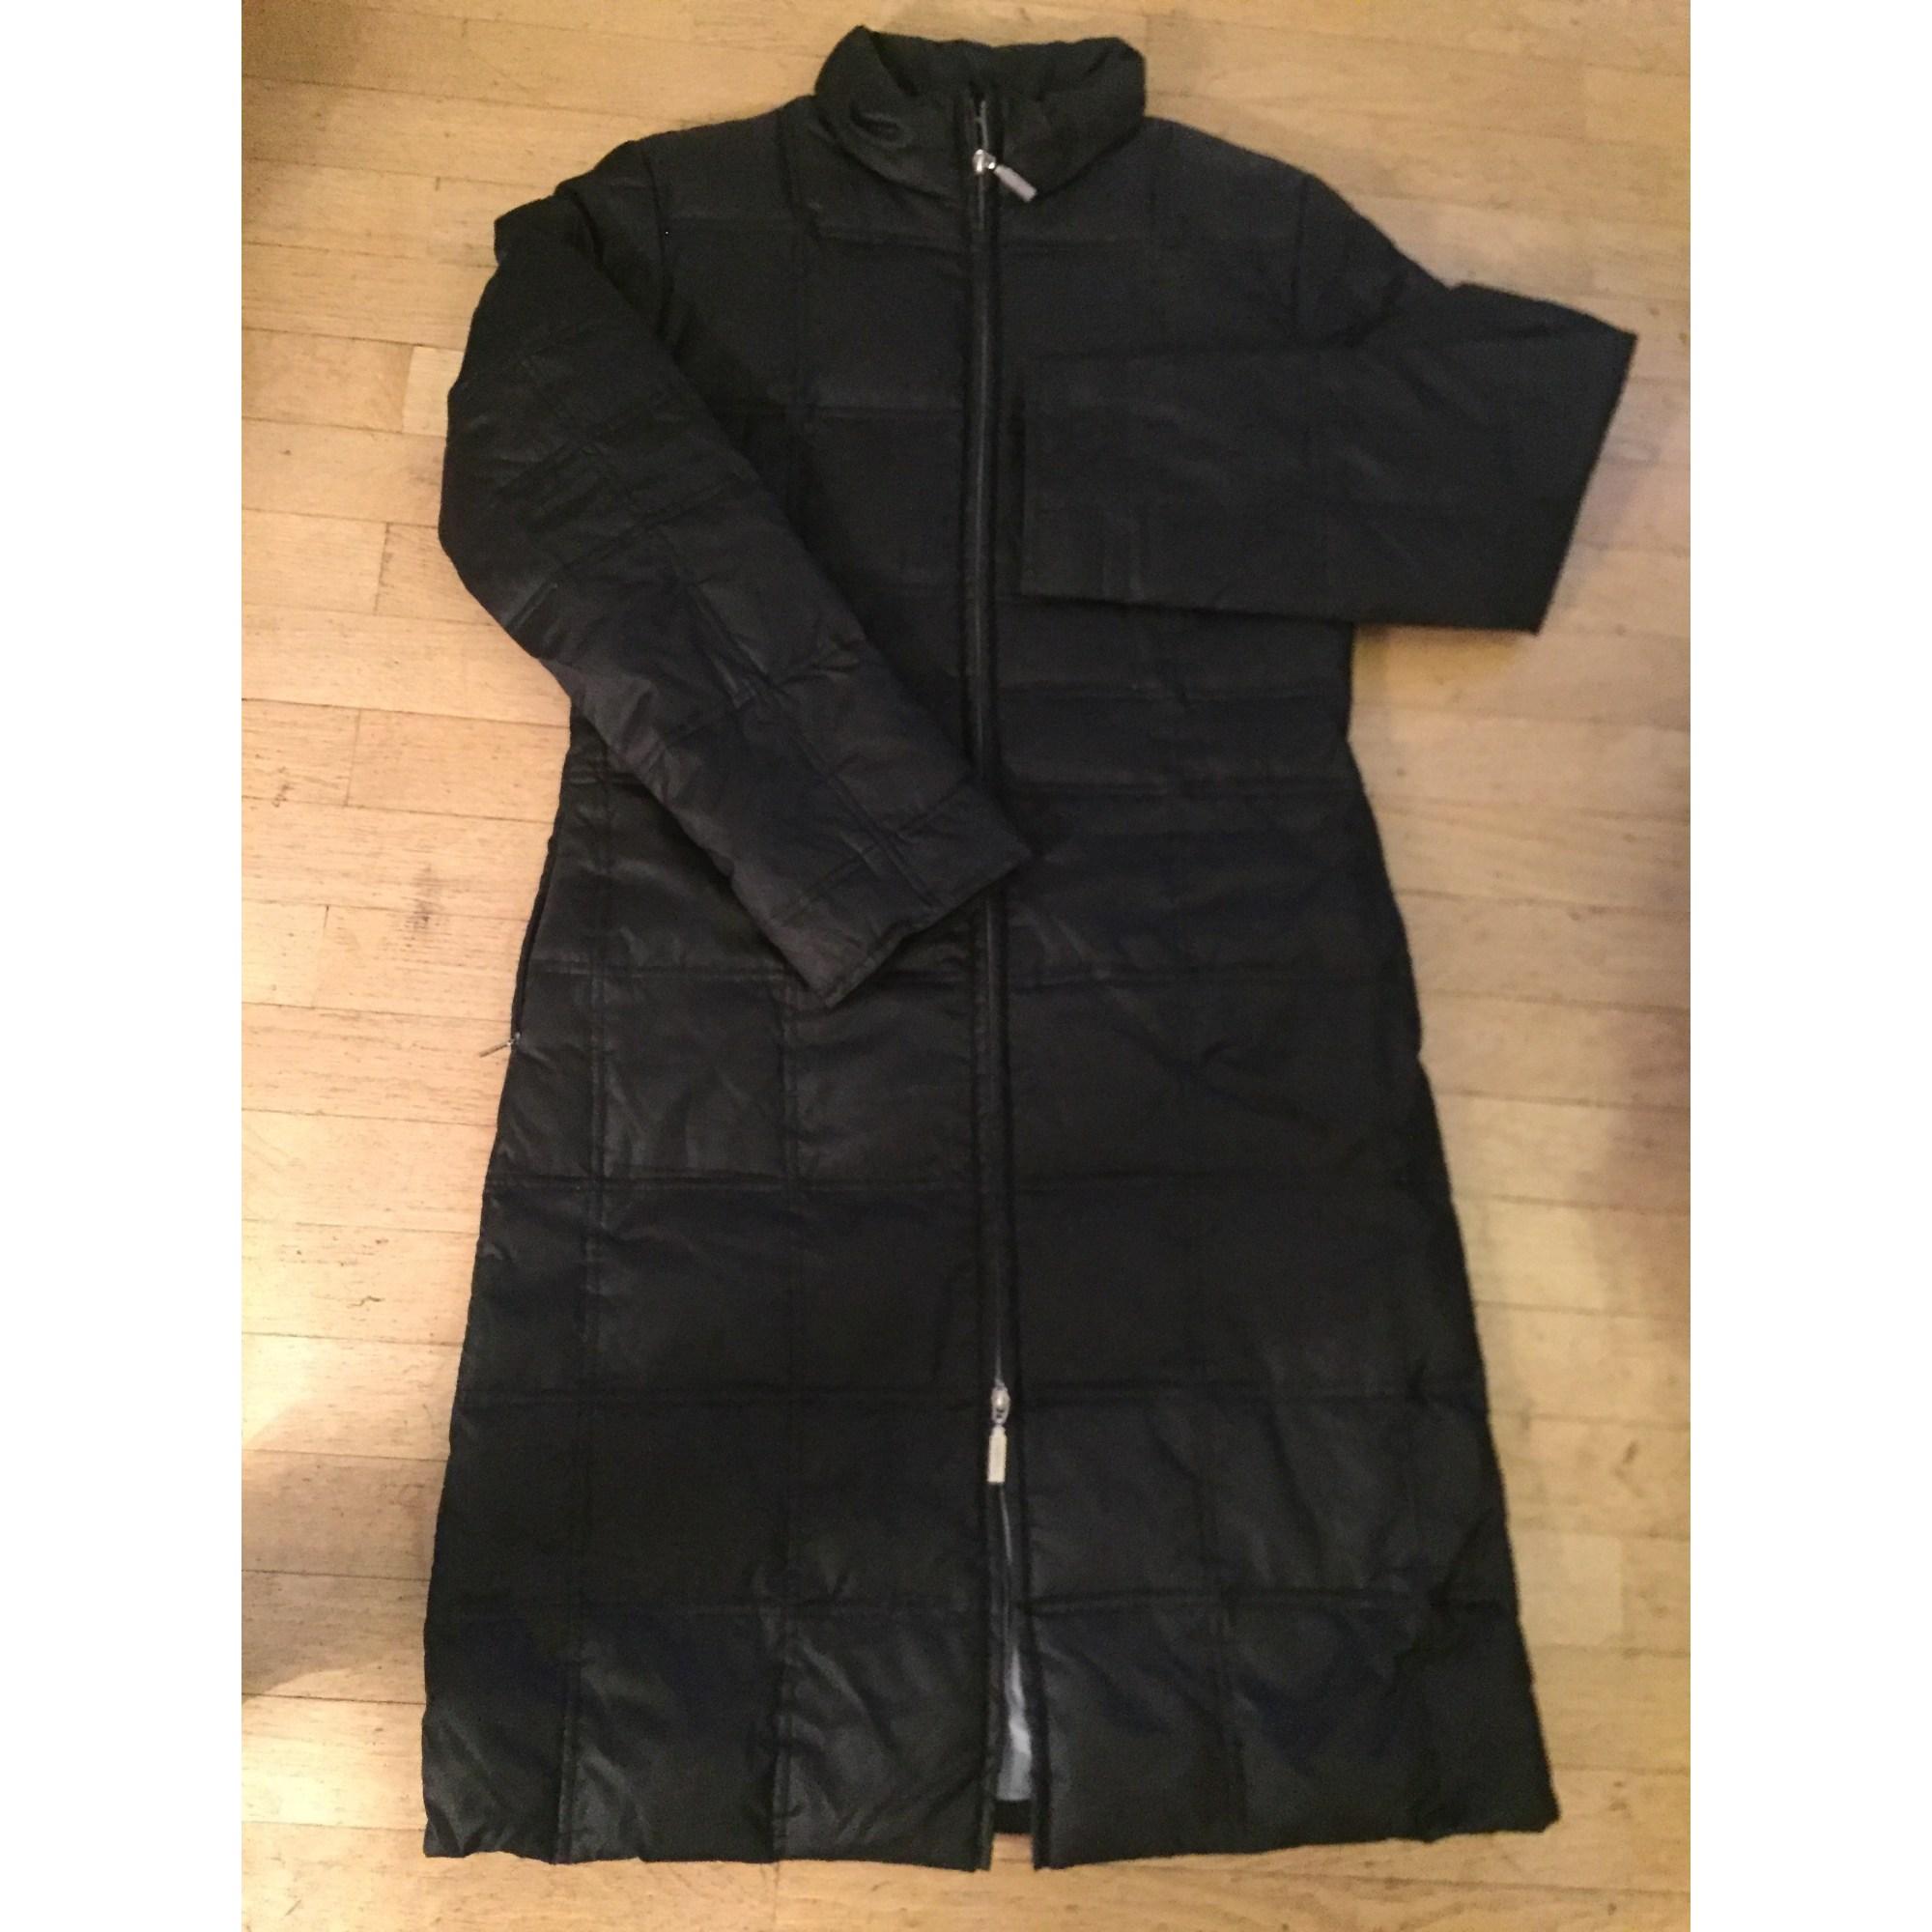 Doudoune CAROLL 38 (M, T2) noir - 7249829 0fda4862751